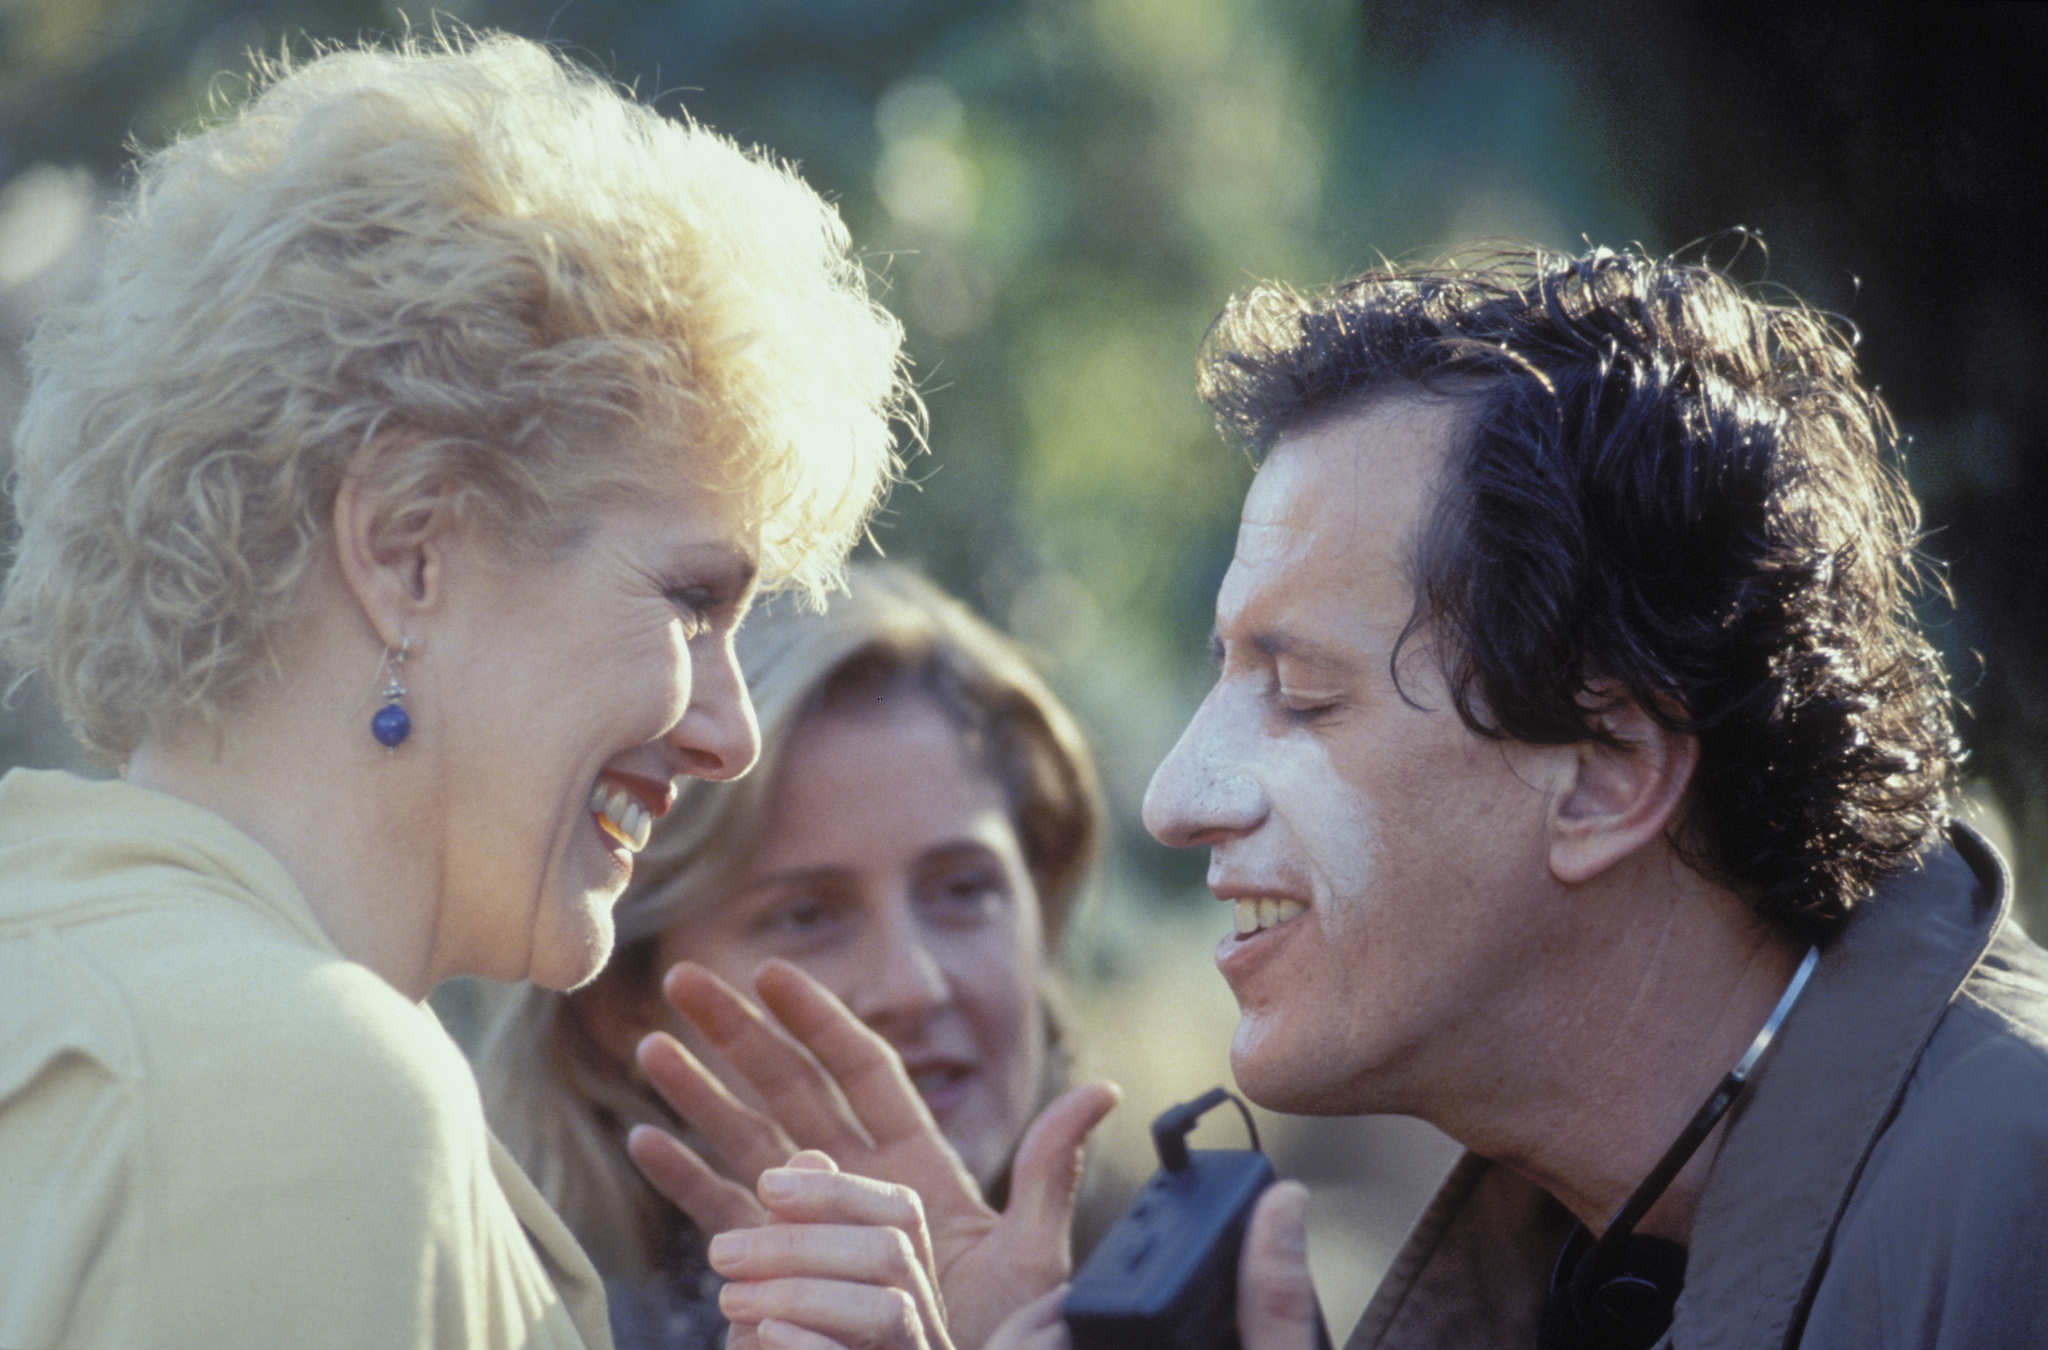 Lynn Redgrave, Geoffrey Rush, and Sonia Todd in Shine (1996)